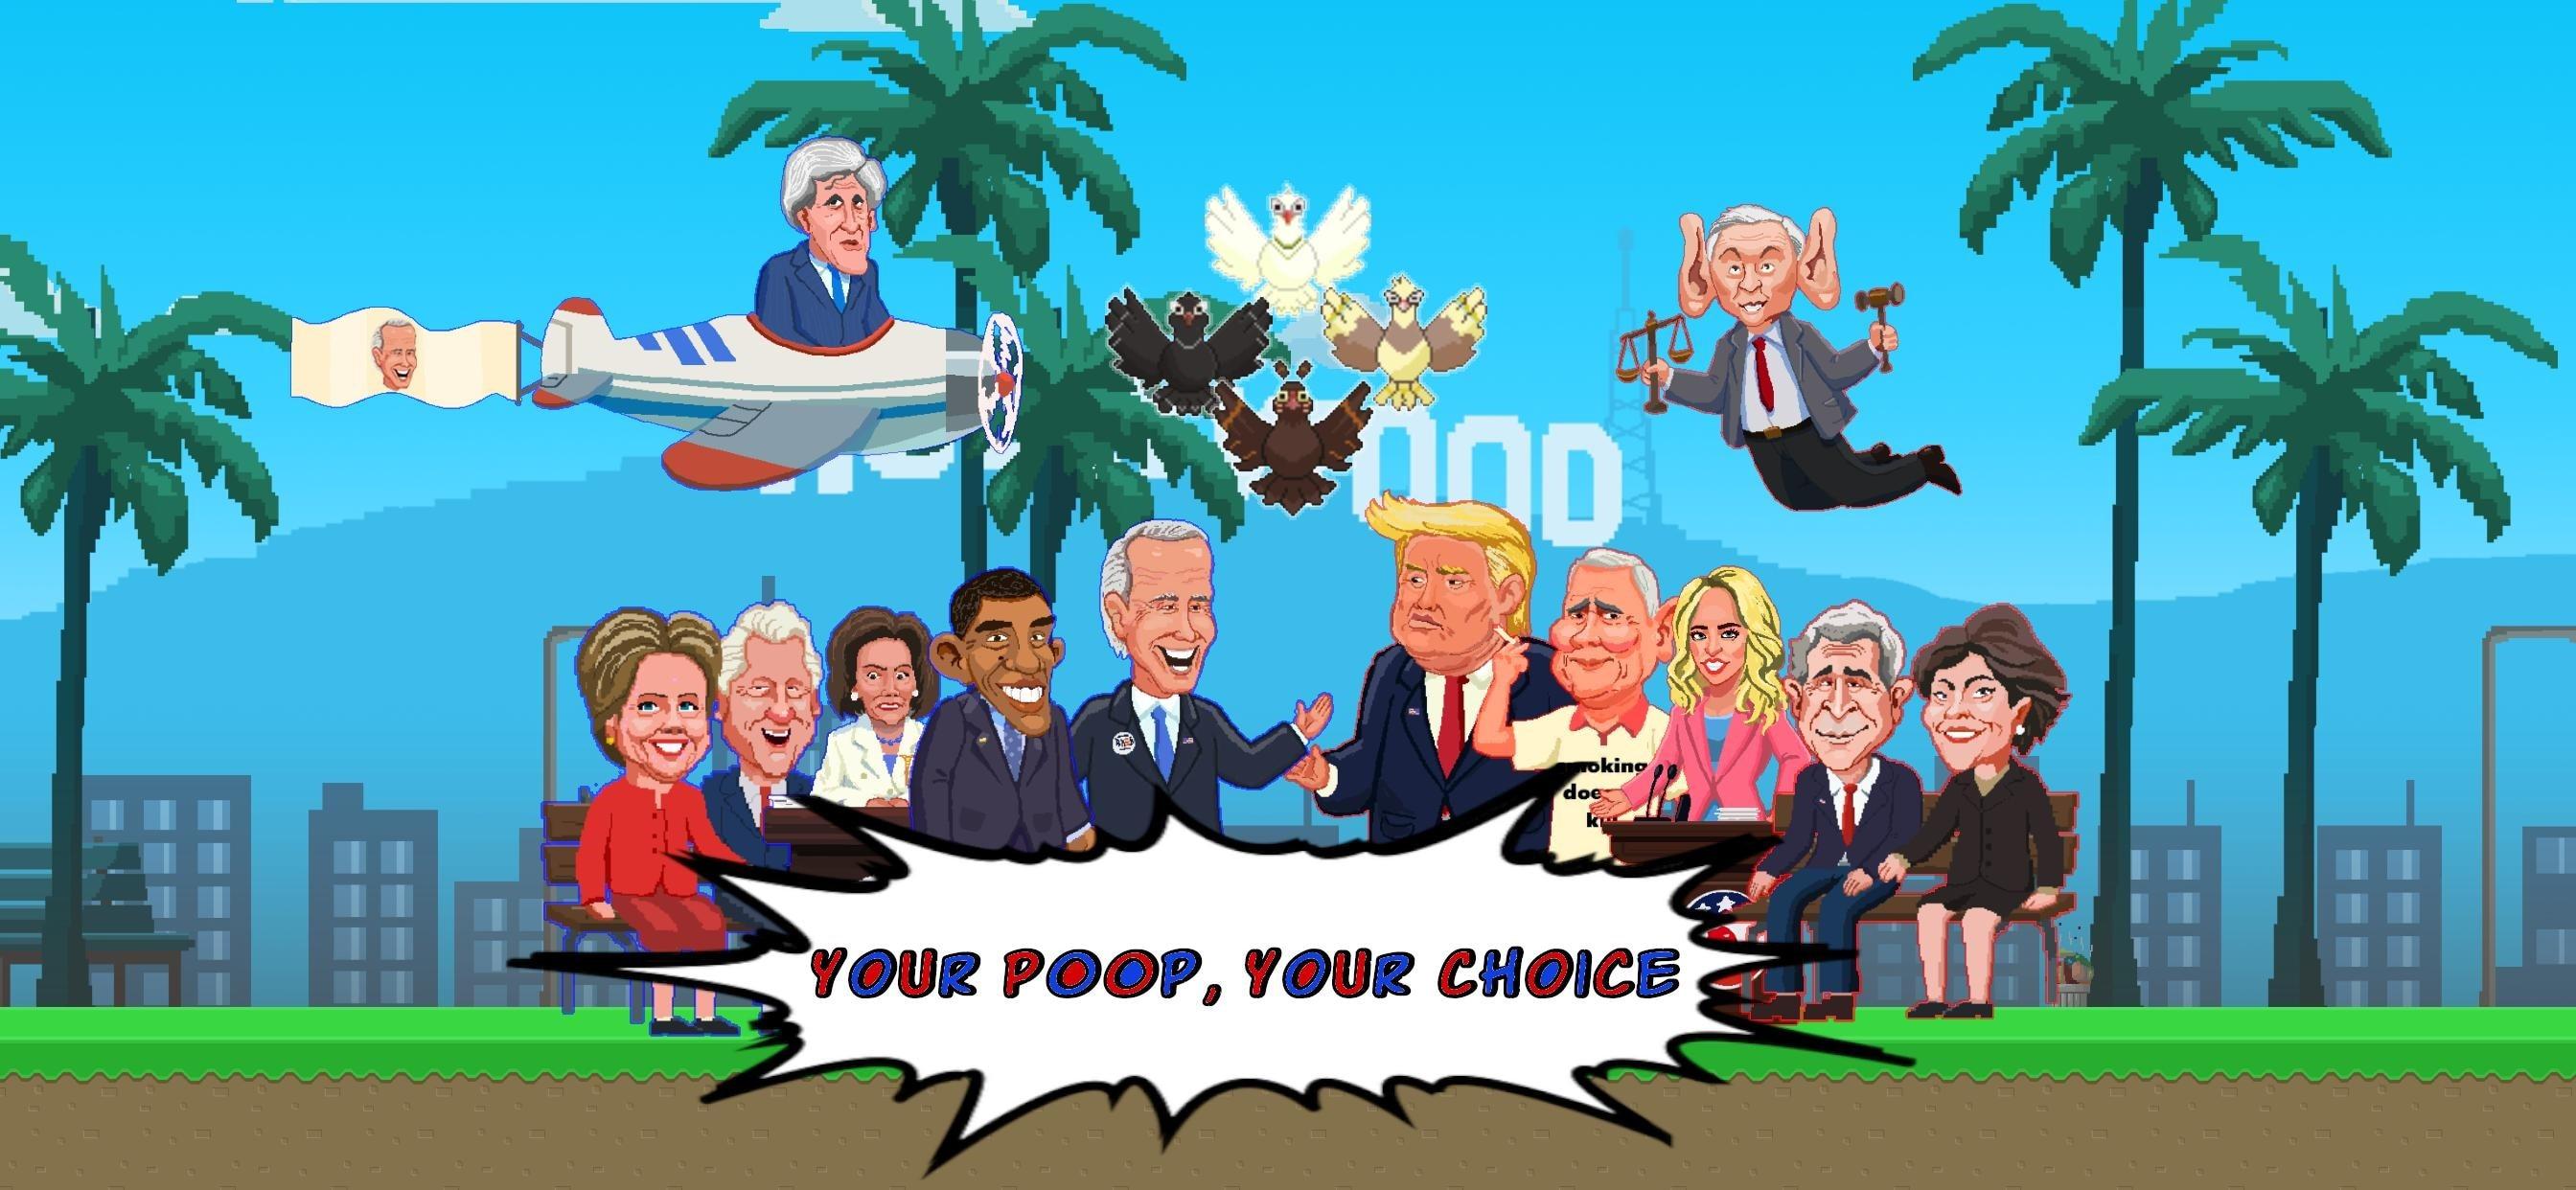 pigeon-poolitics-2020-poster